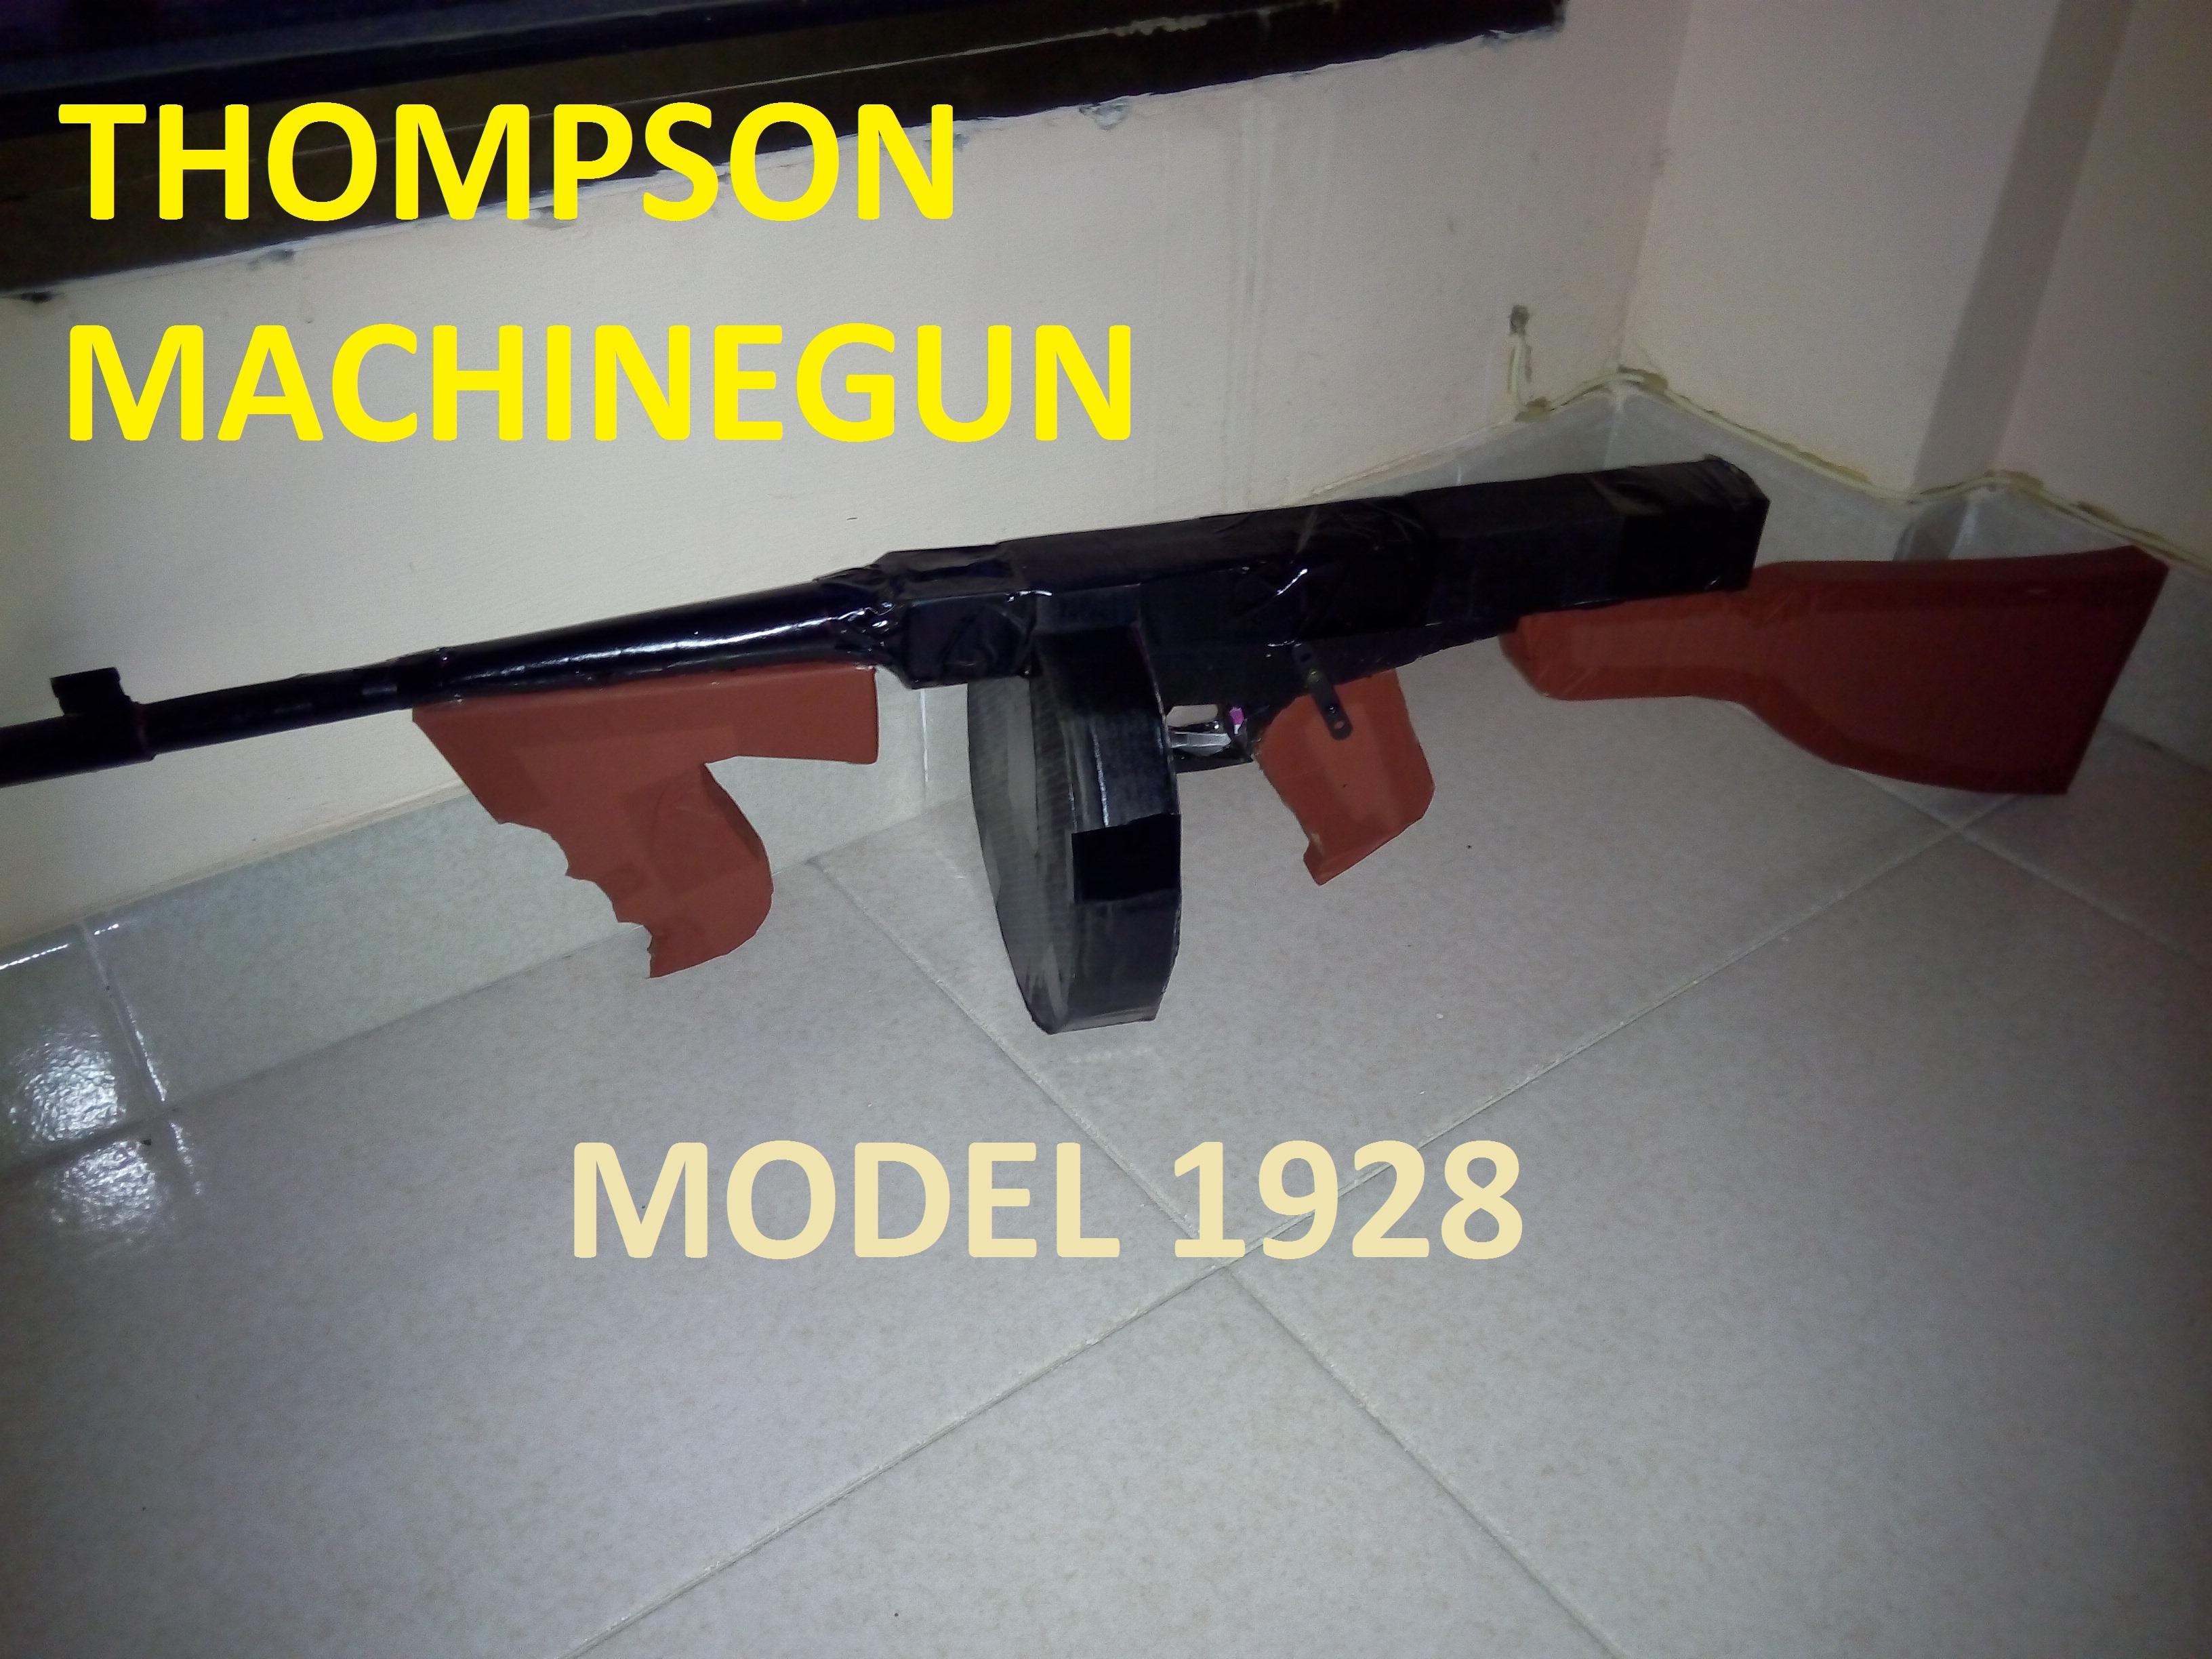 Picture of Thompson Machinegun (Tommy Gun) for Atrezzo